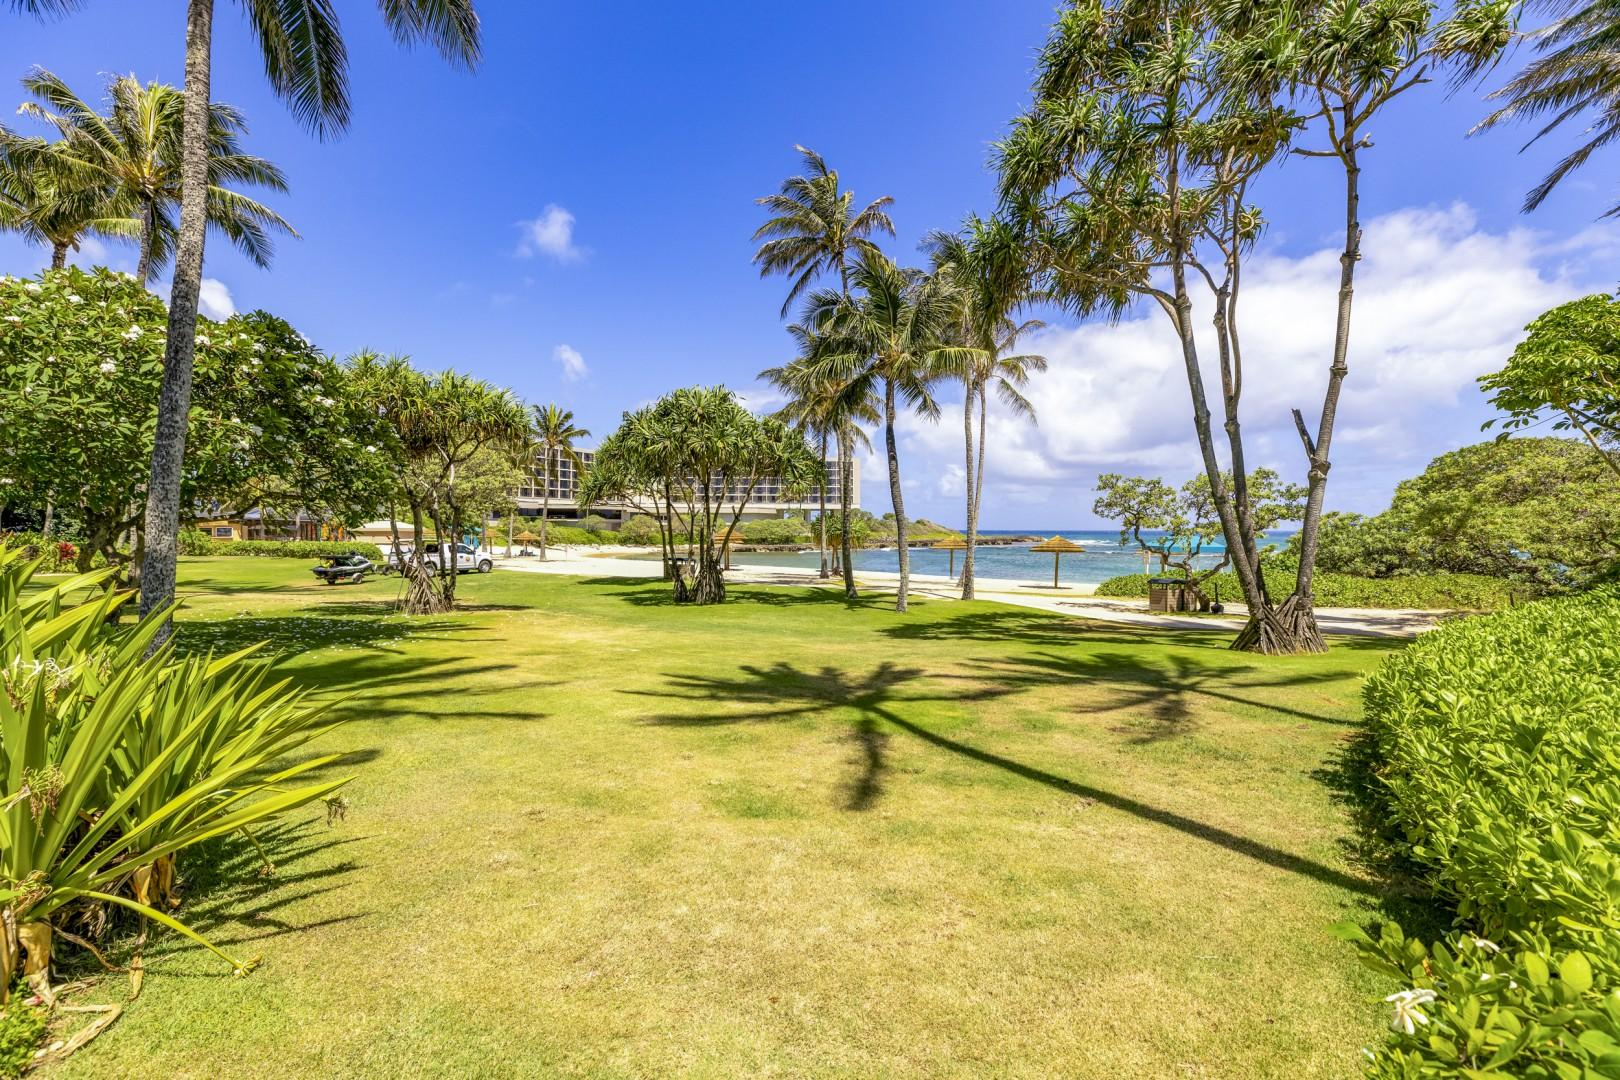 Bay View Beach Lawn